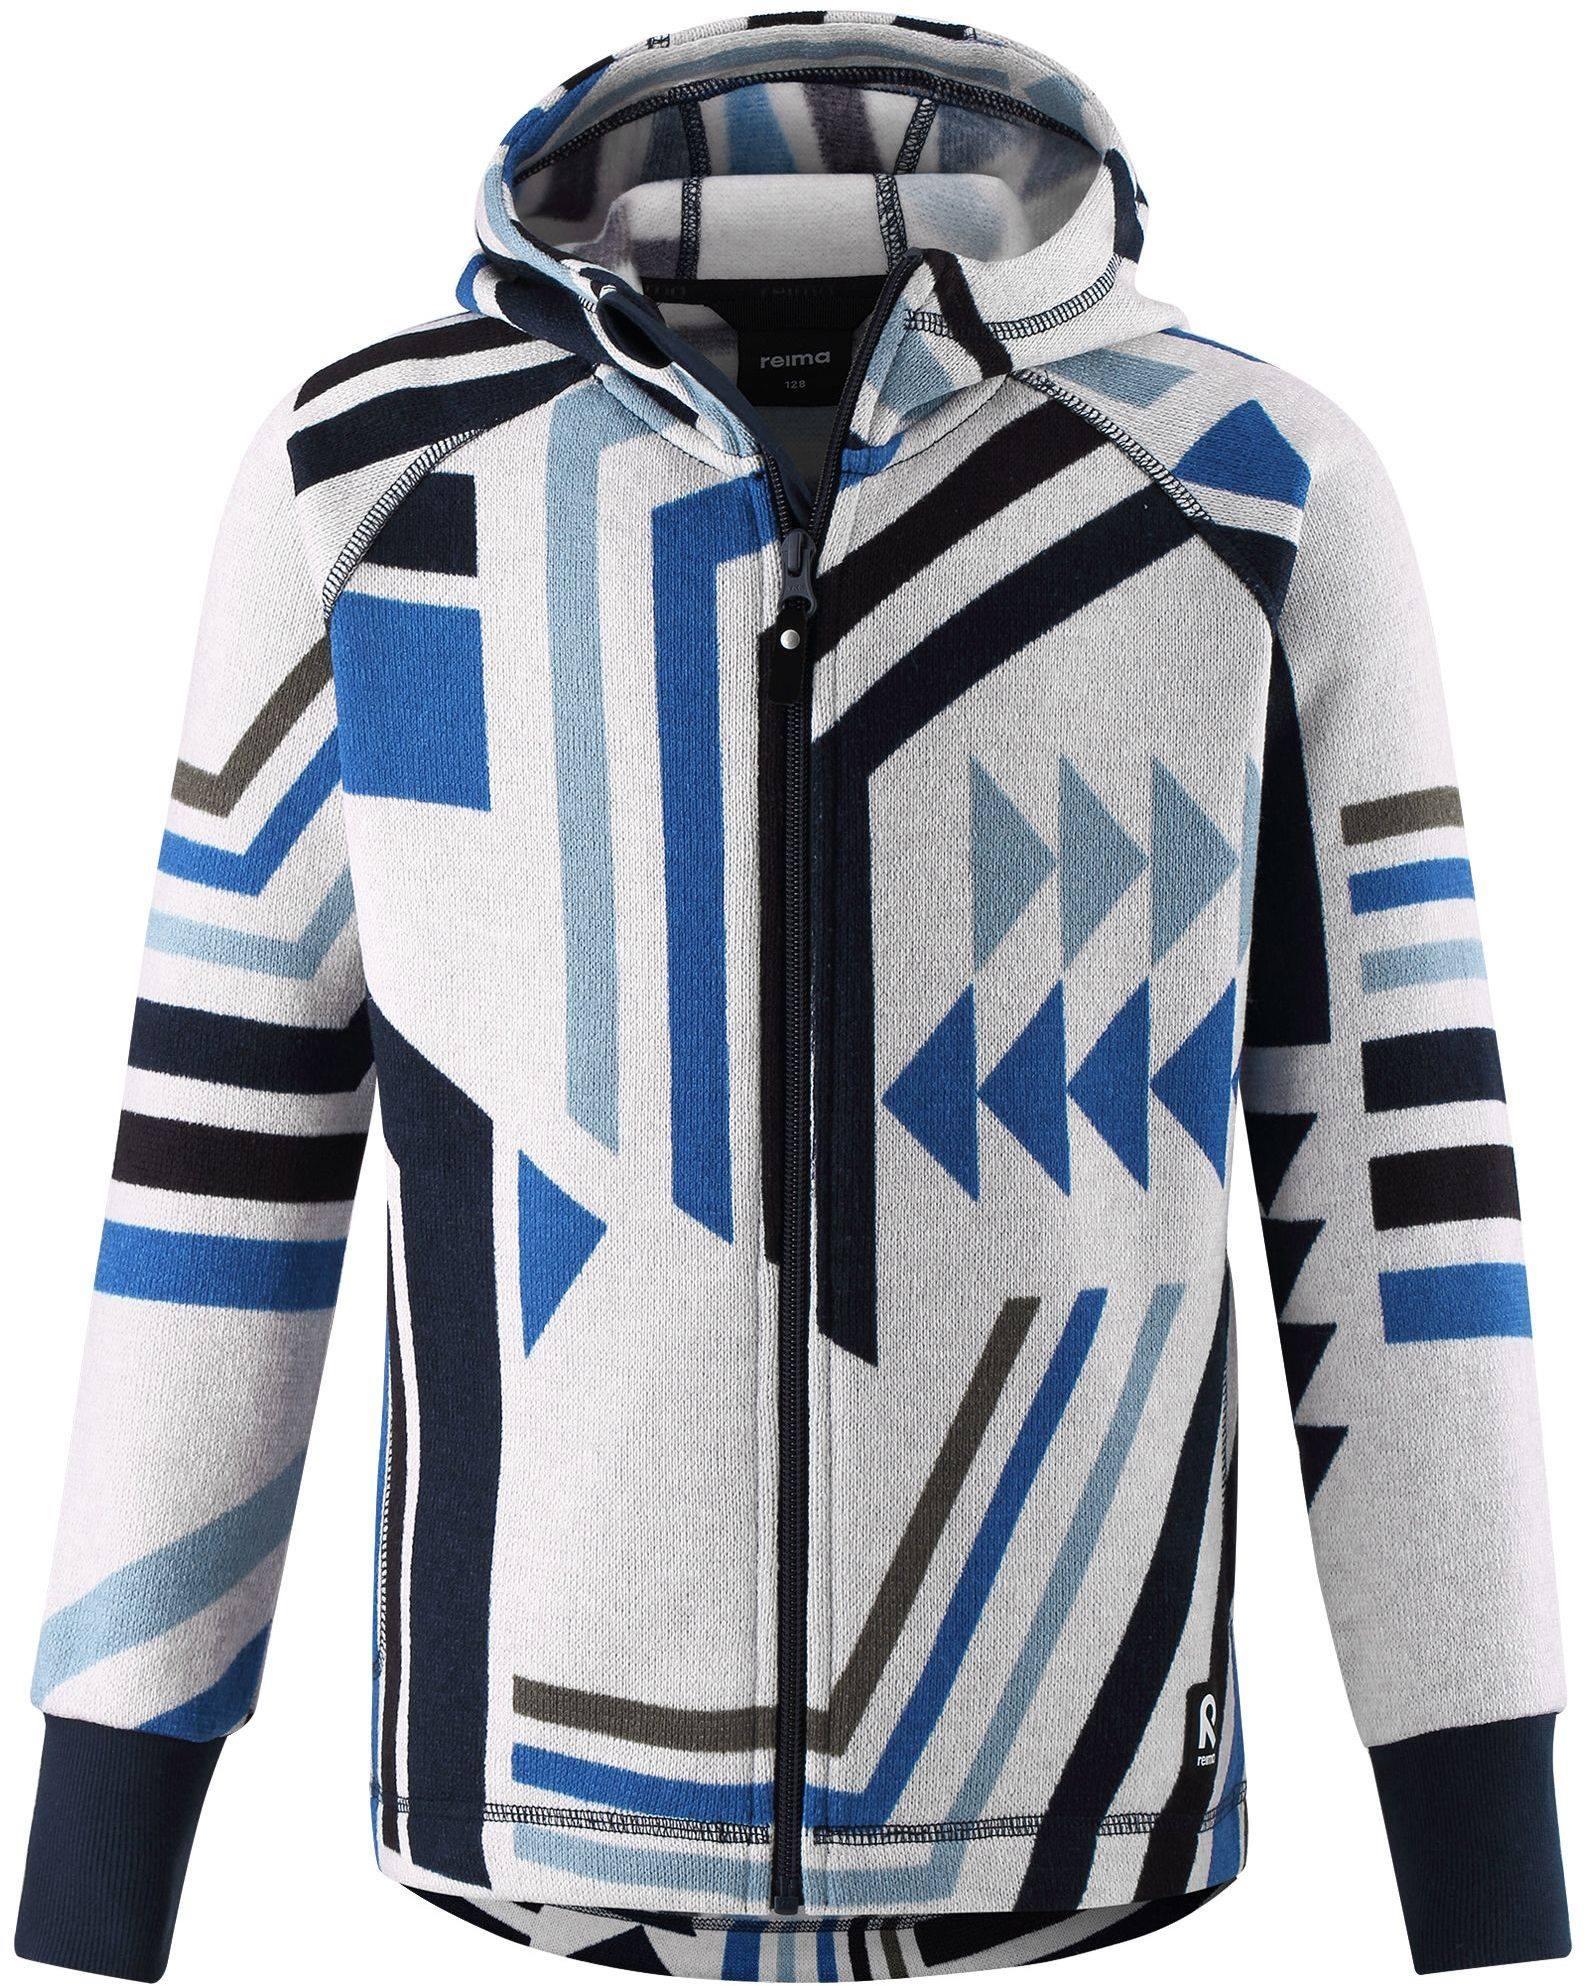 Reima Northern - Marine Blue detsky chlapcensky fleecovy sveter 104 110 116 122 128 134